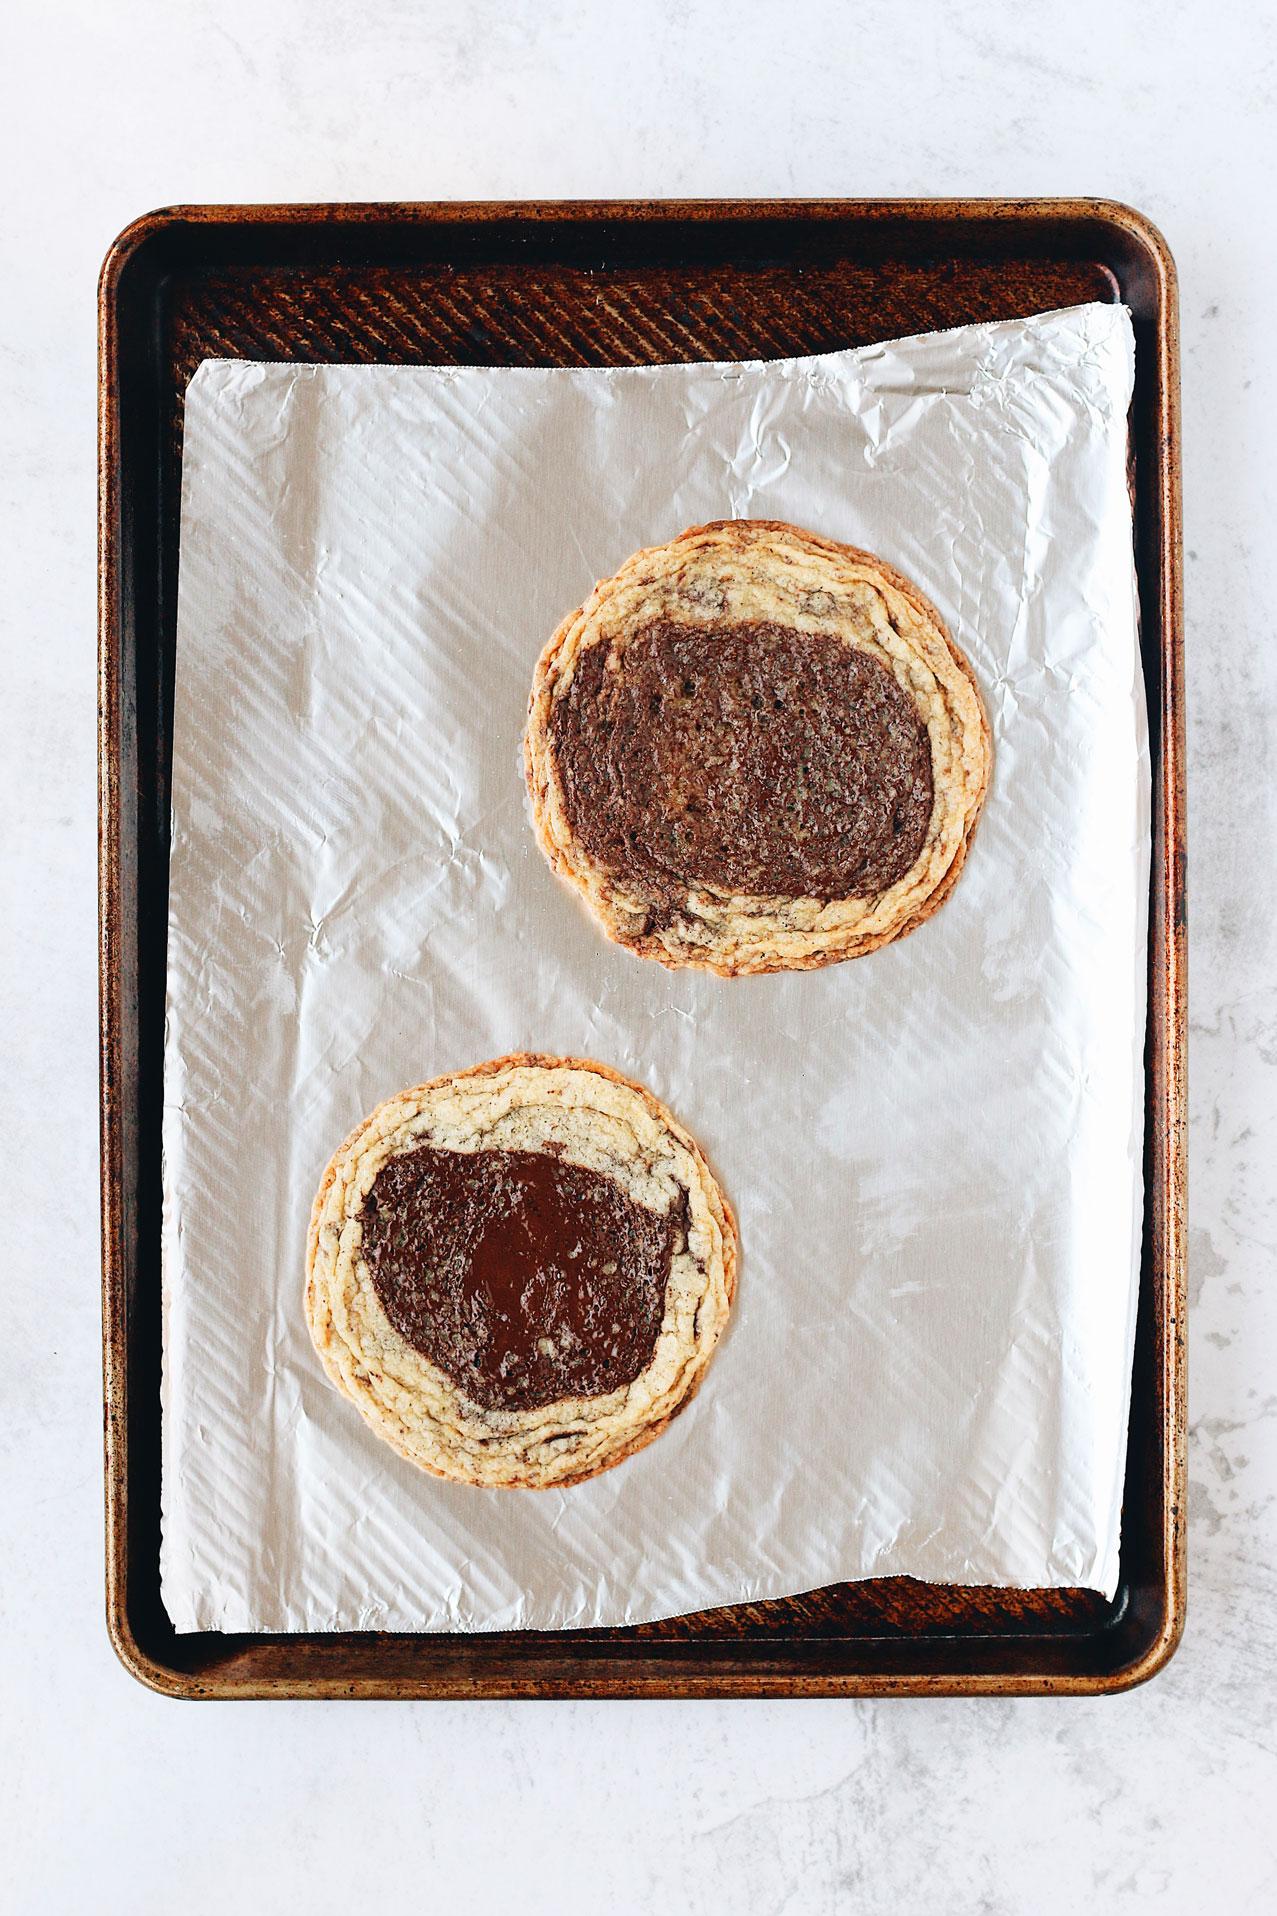 herbakinglab-best-chocolate-chip-cookie-bake-off-panbanging-tray